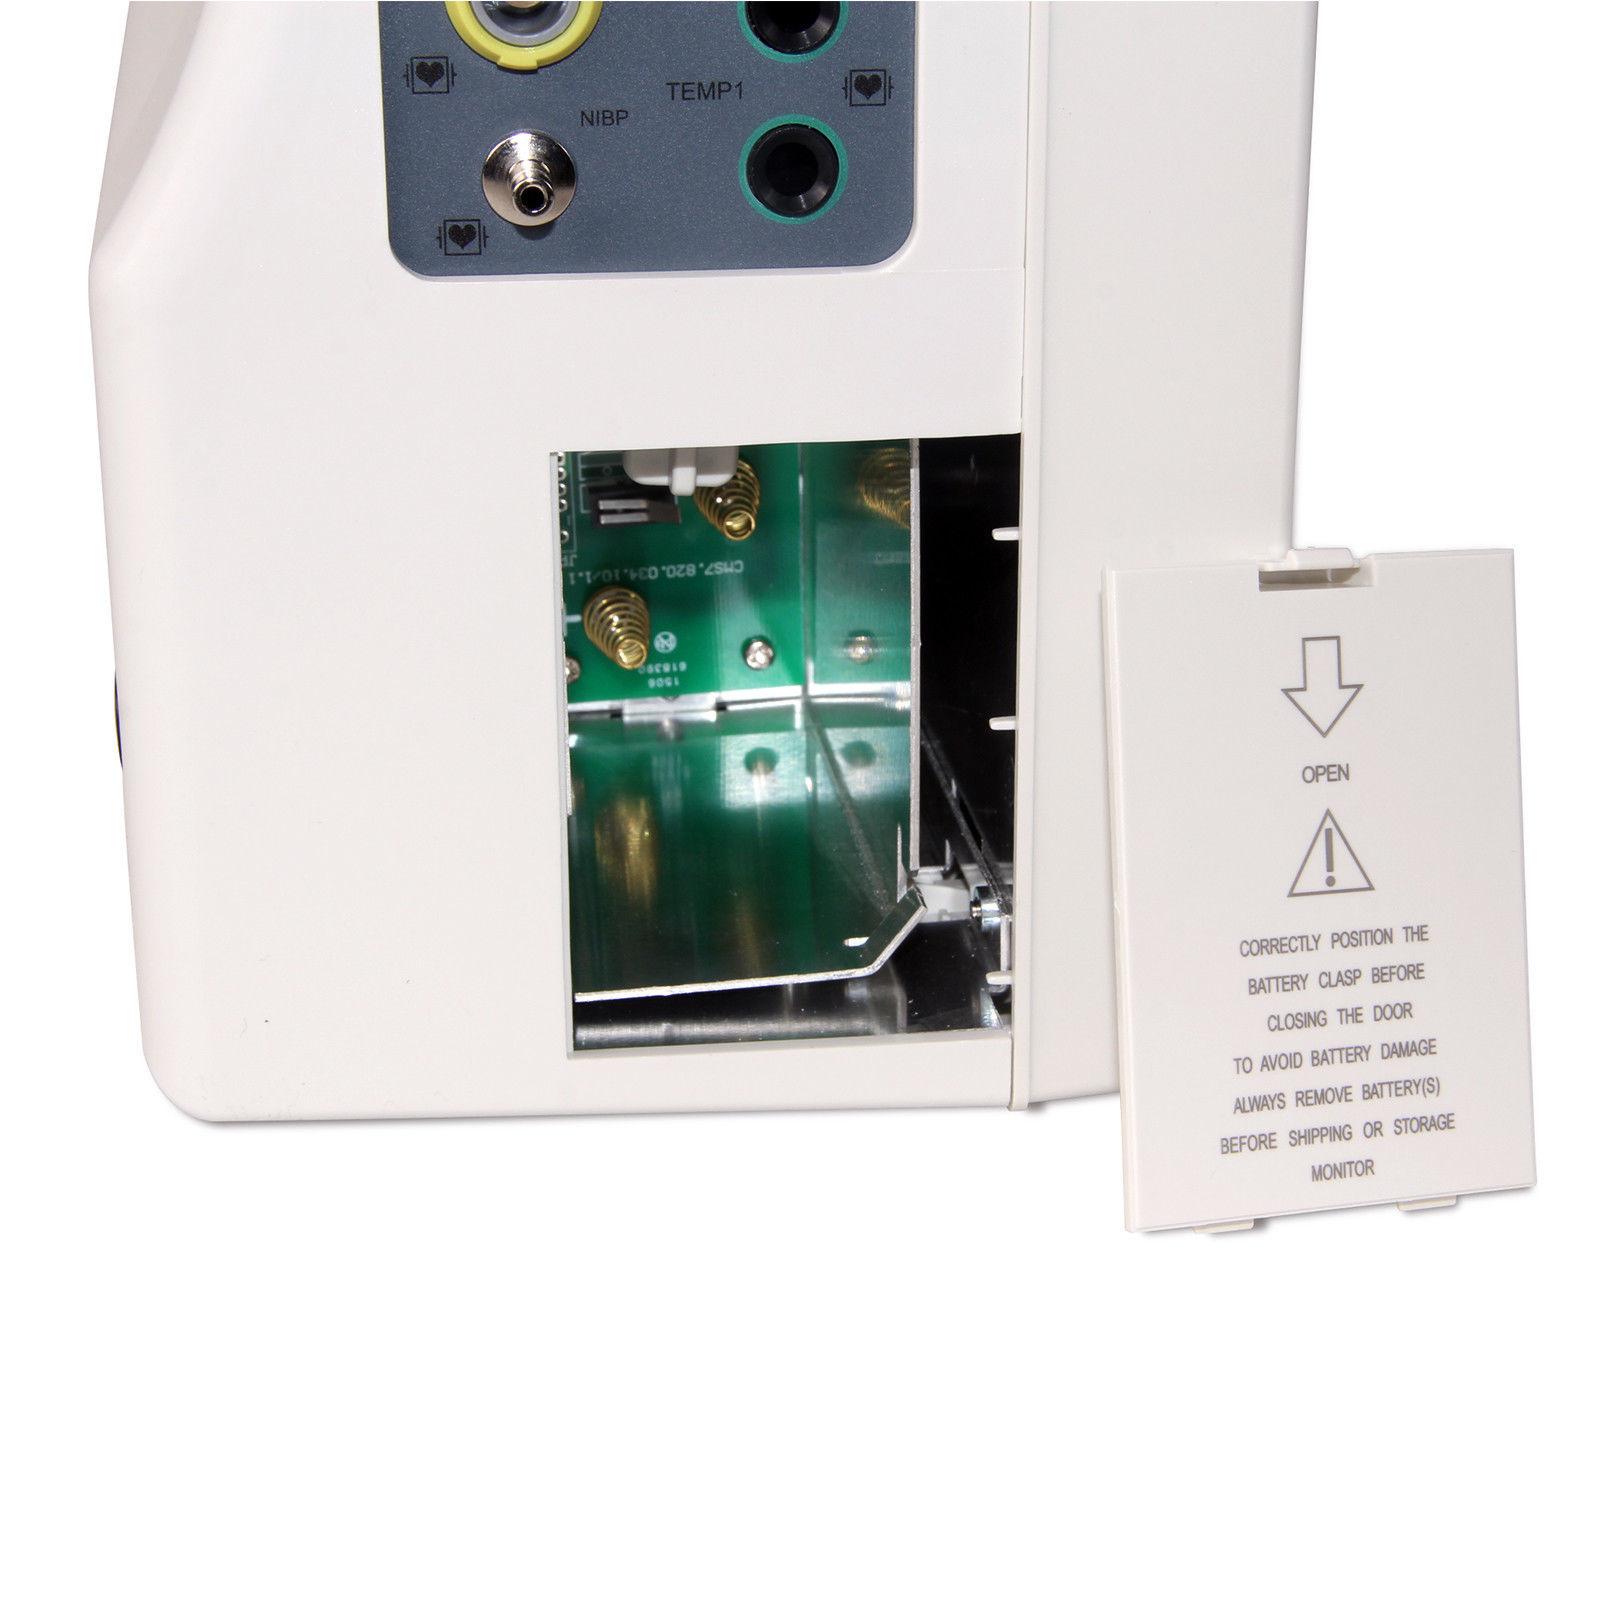 CONTEC CMS7000 Portable ICU Patient Monitor Vital Signs 6 Parameter Free Printer